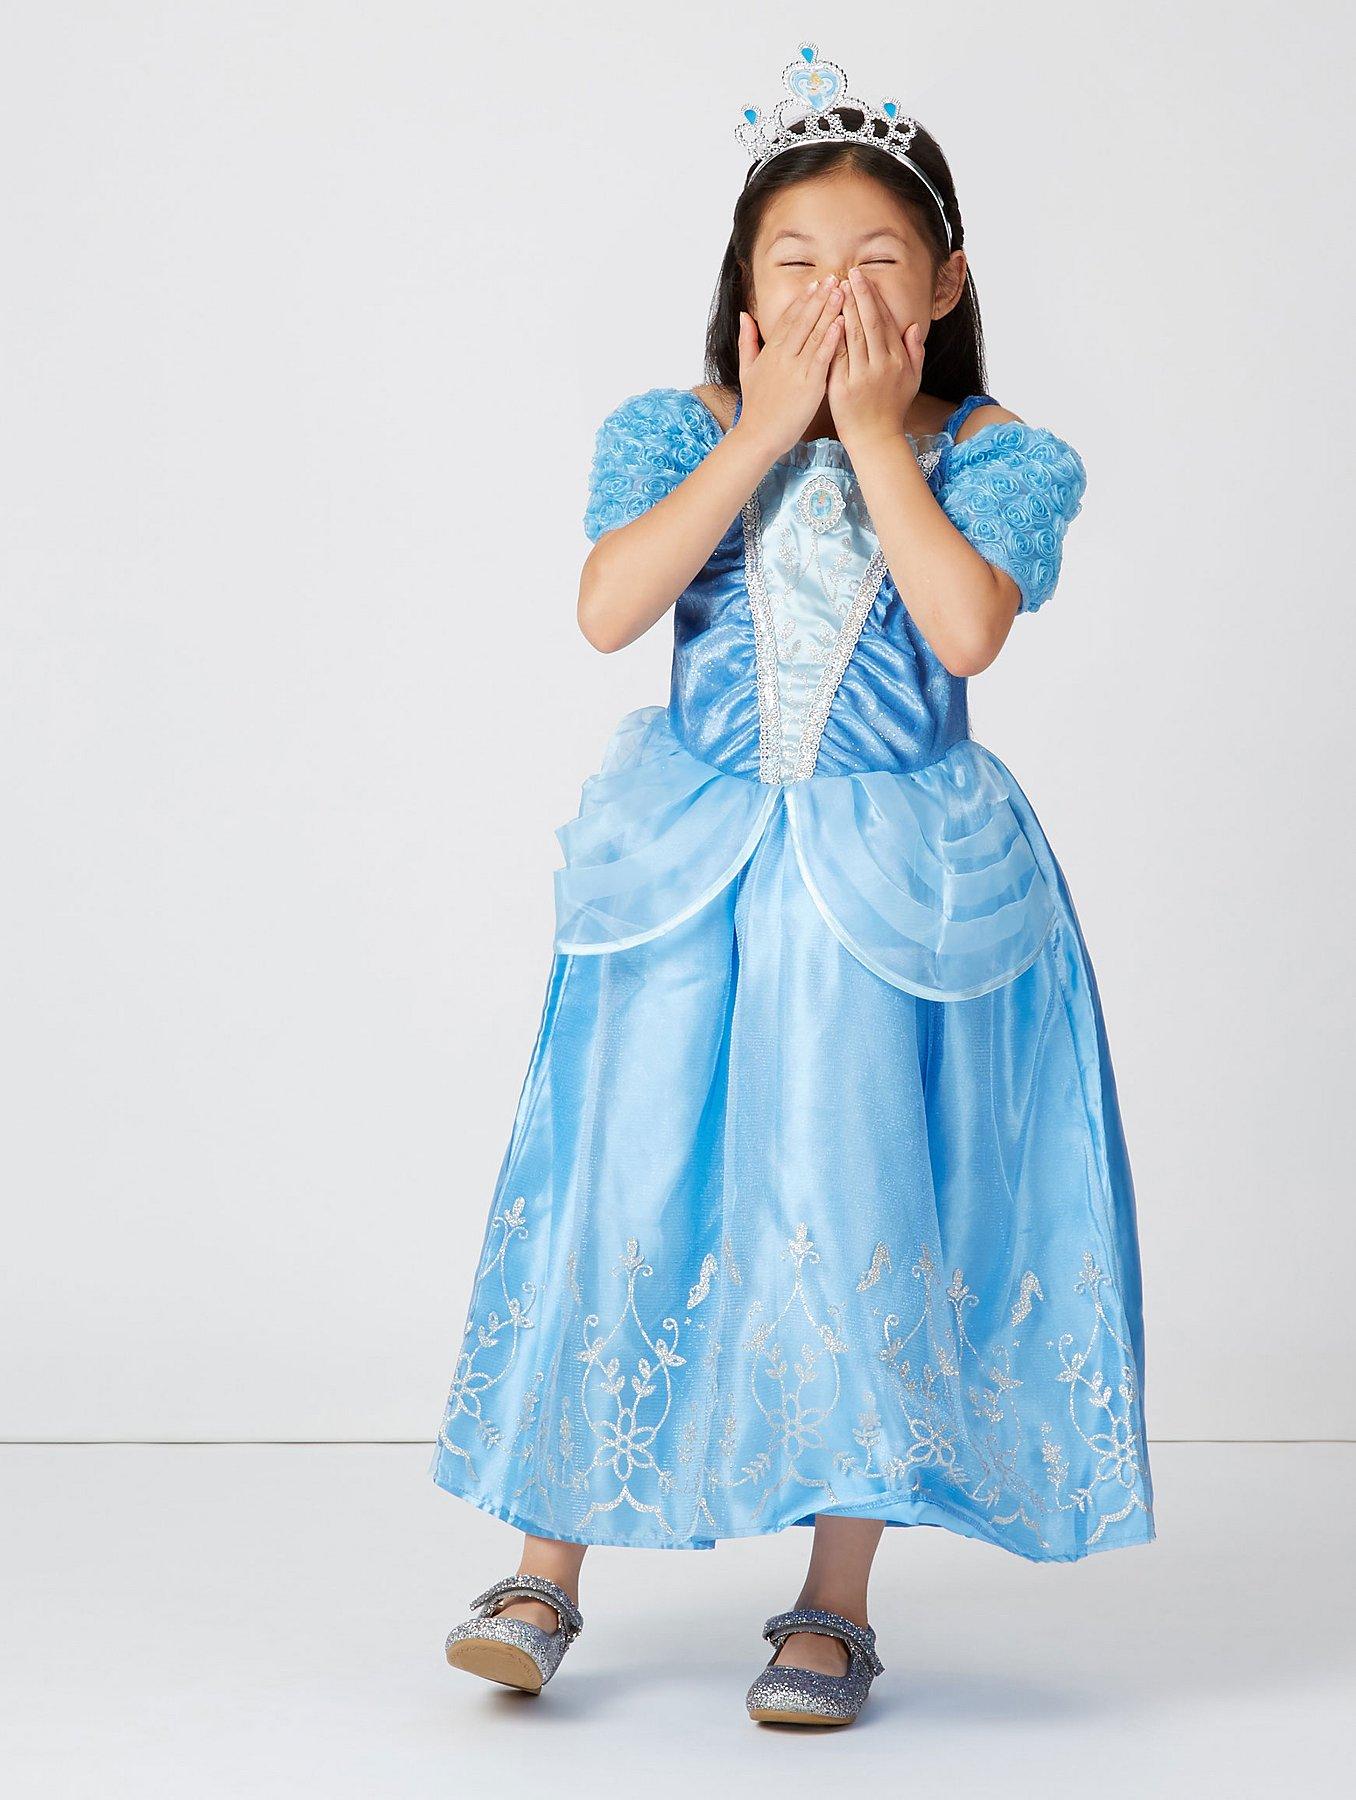 Disney Princess Cinderella Fancy Dress Costume   Kids   George at ASDA